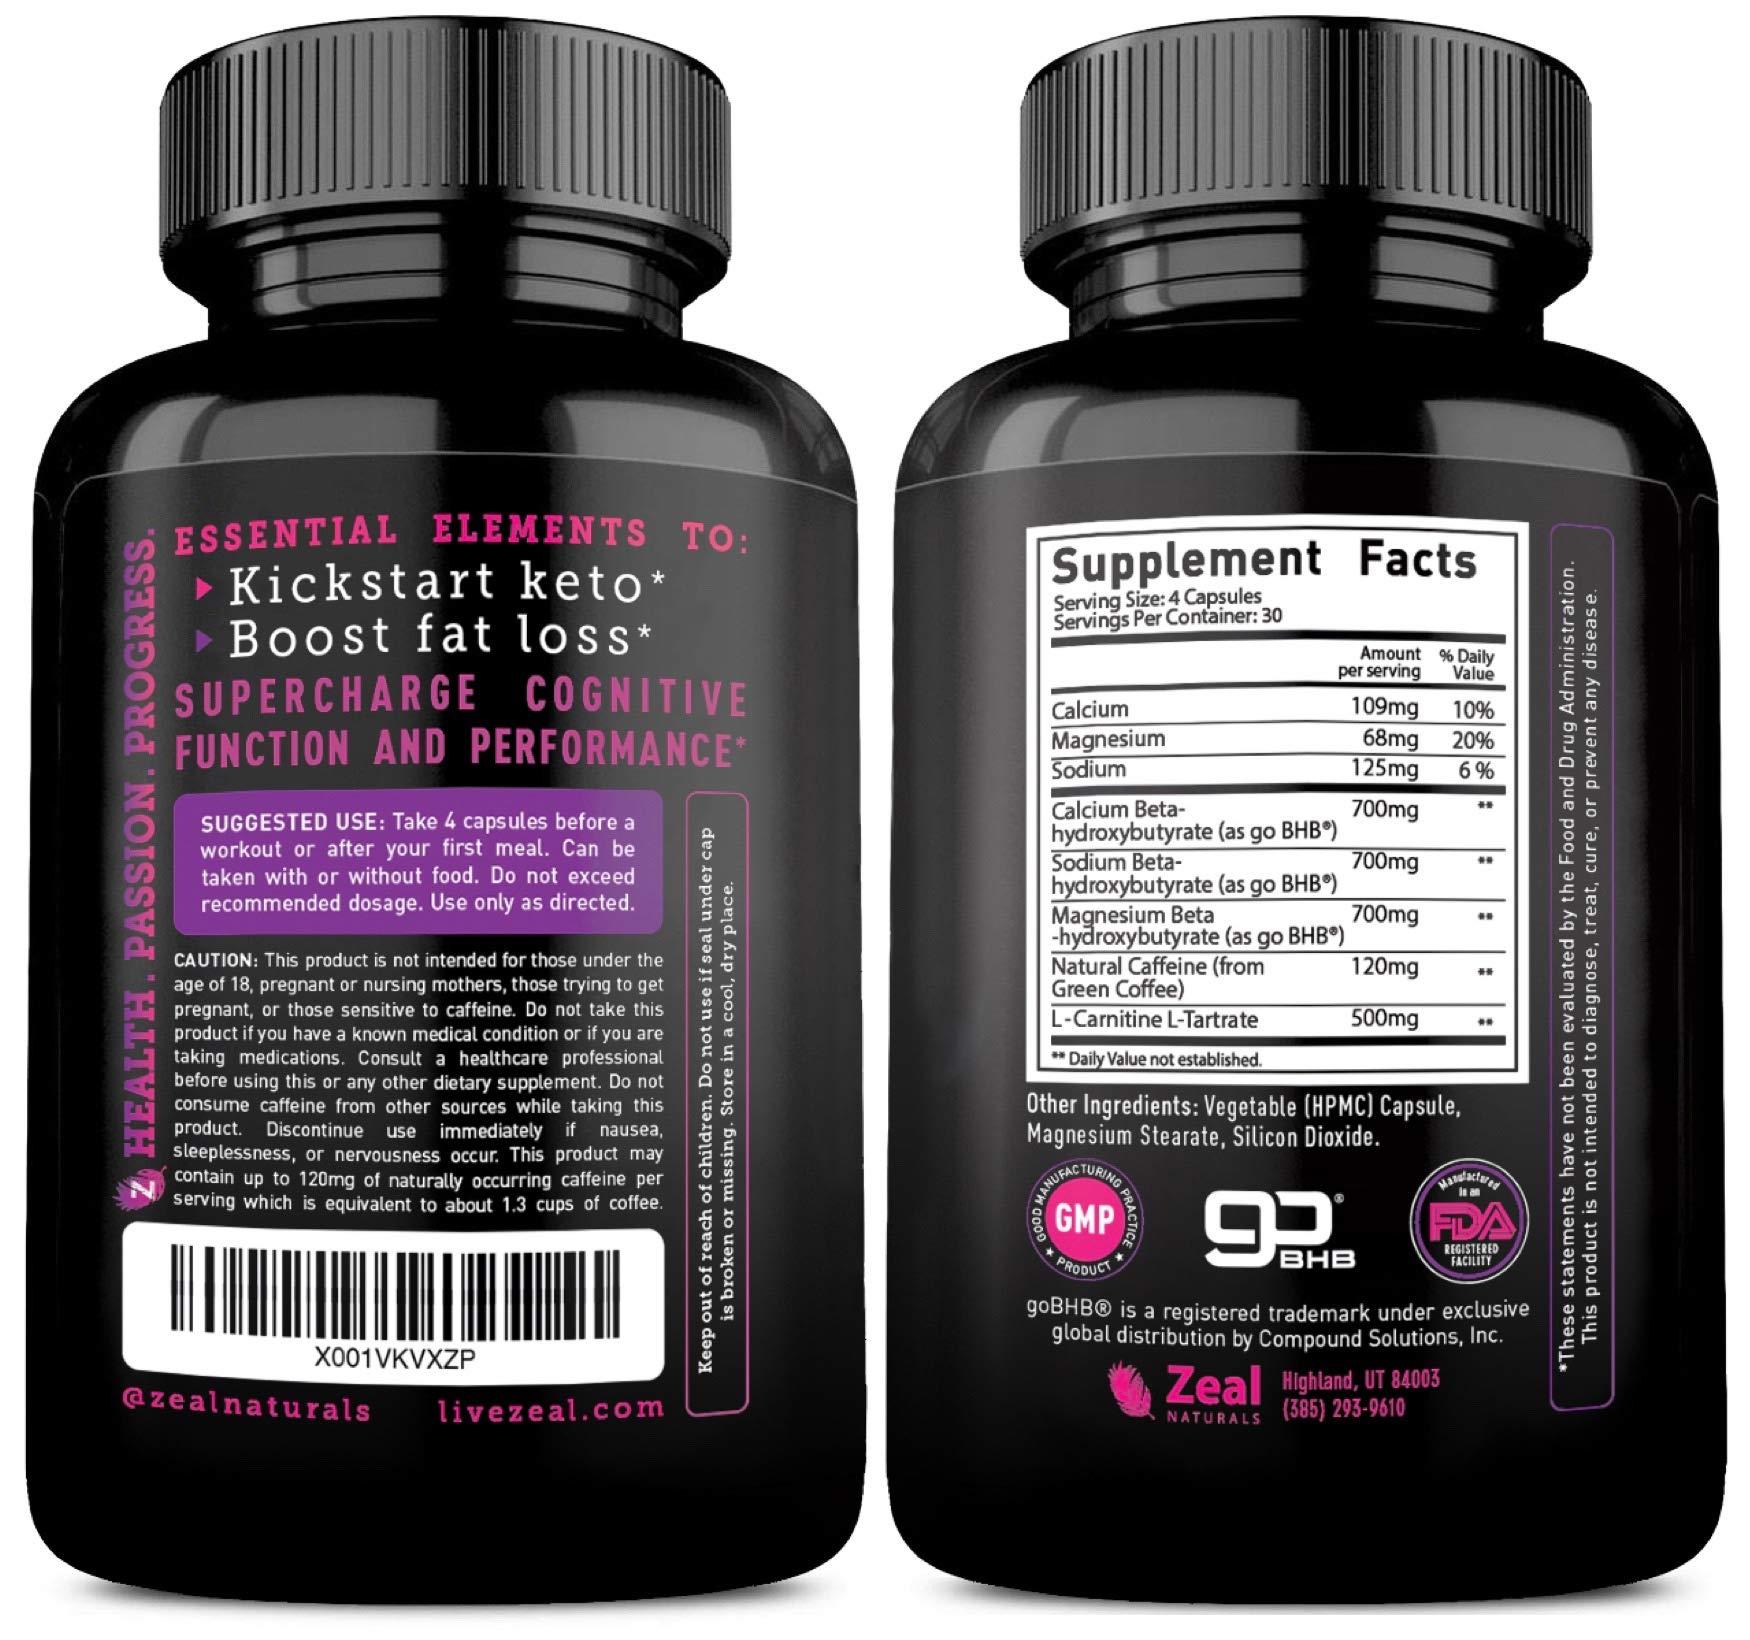 Keto BHB Exogenous Ketones Pills (2720mg | 120 Capsules) Keto Pills w. goBHB Salts, Natural Caffeine & L-Carnitine - Keto BHB Oil Capsules Beta Hydroxybutyrate for Weight Loss Keto Vitamins Keto Salts by Zeal Naturals (Image #2)